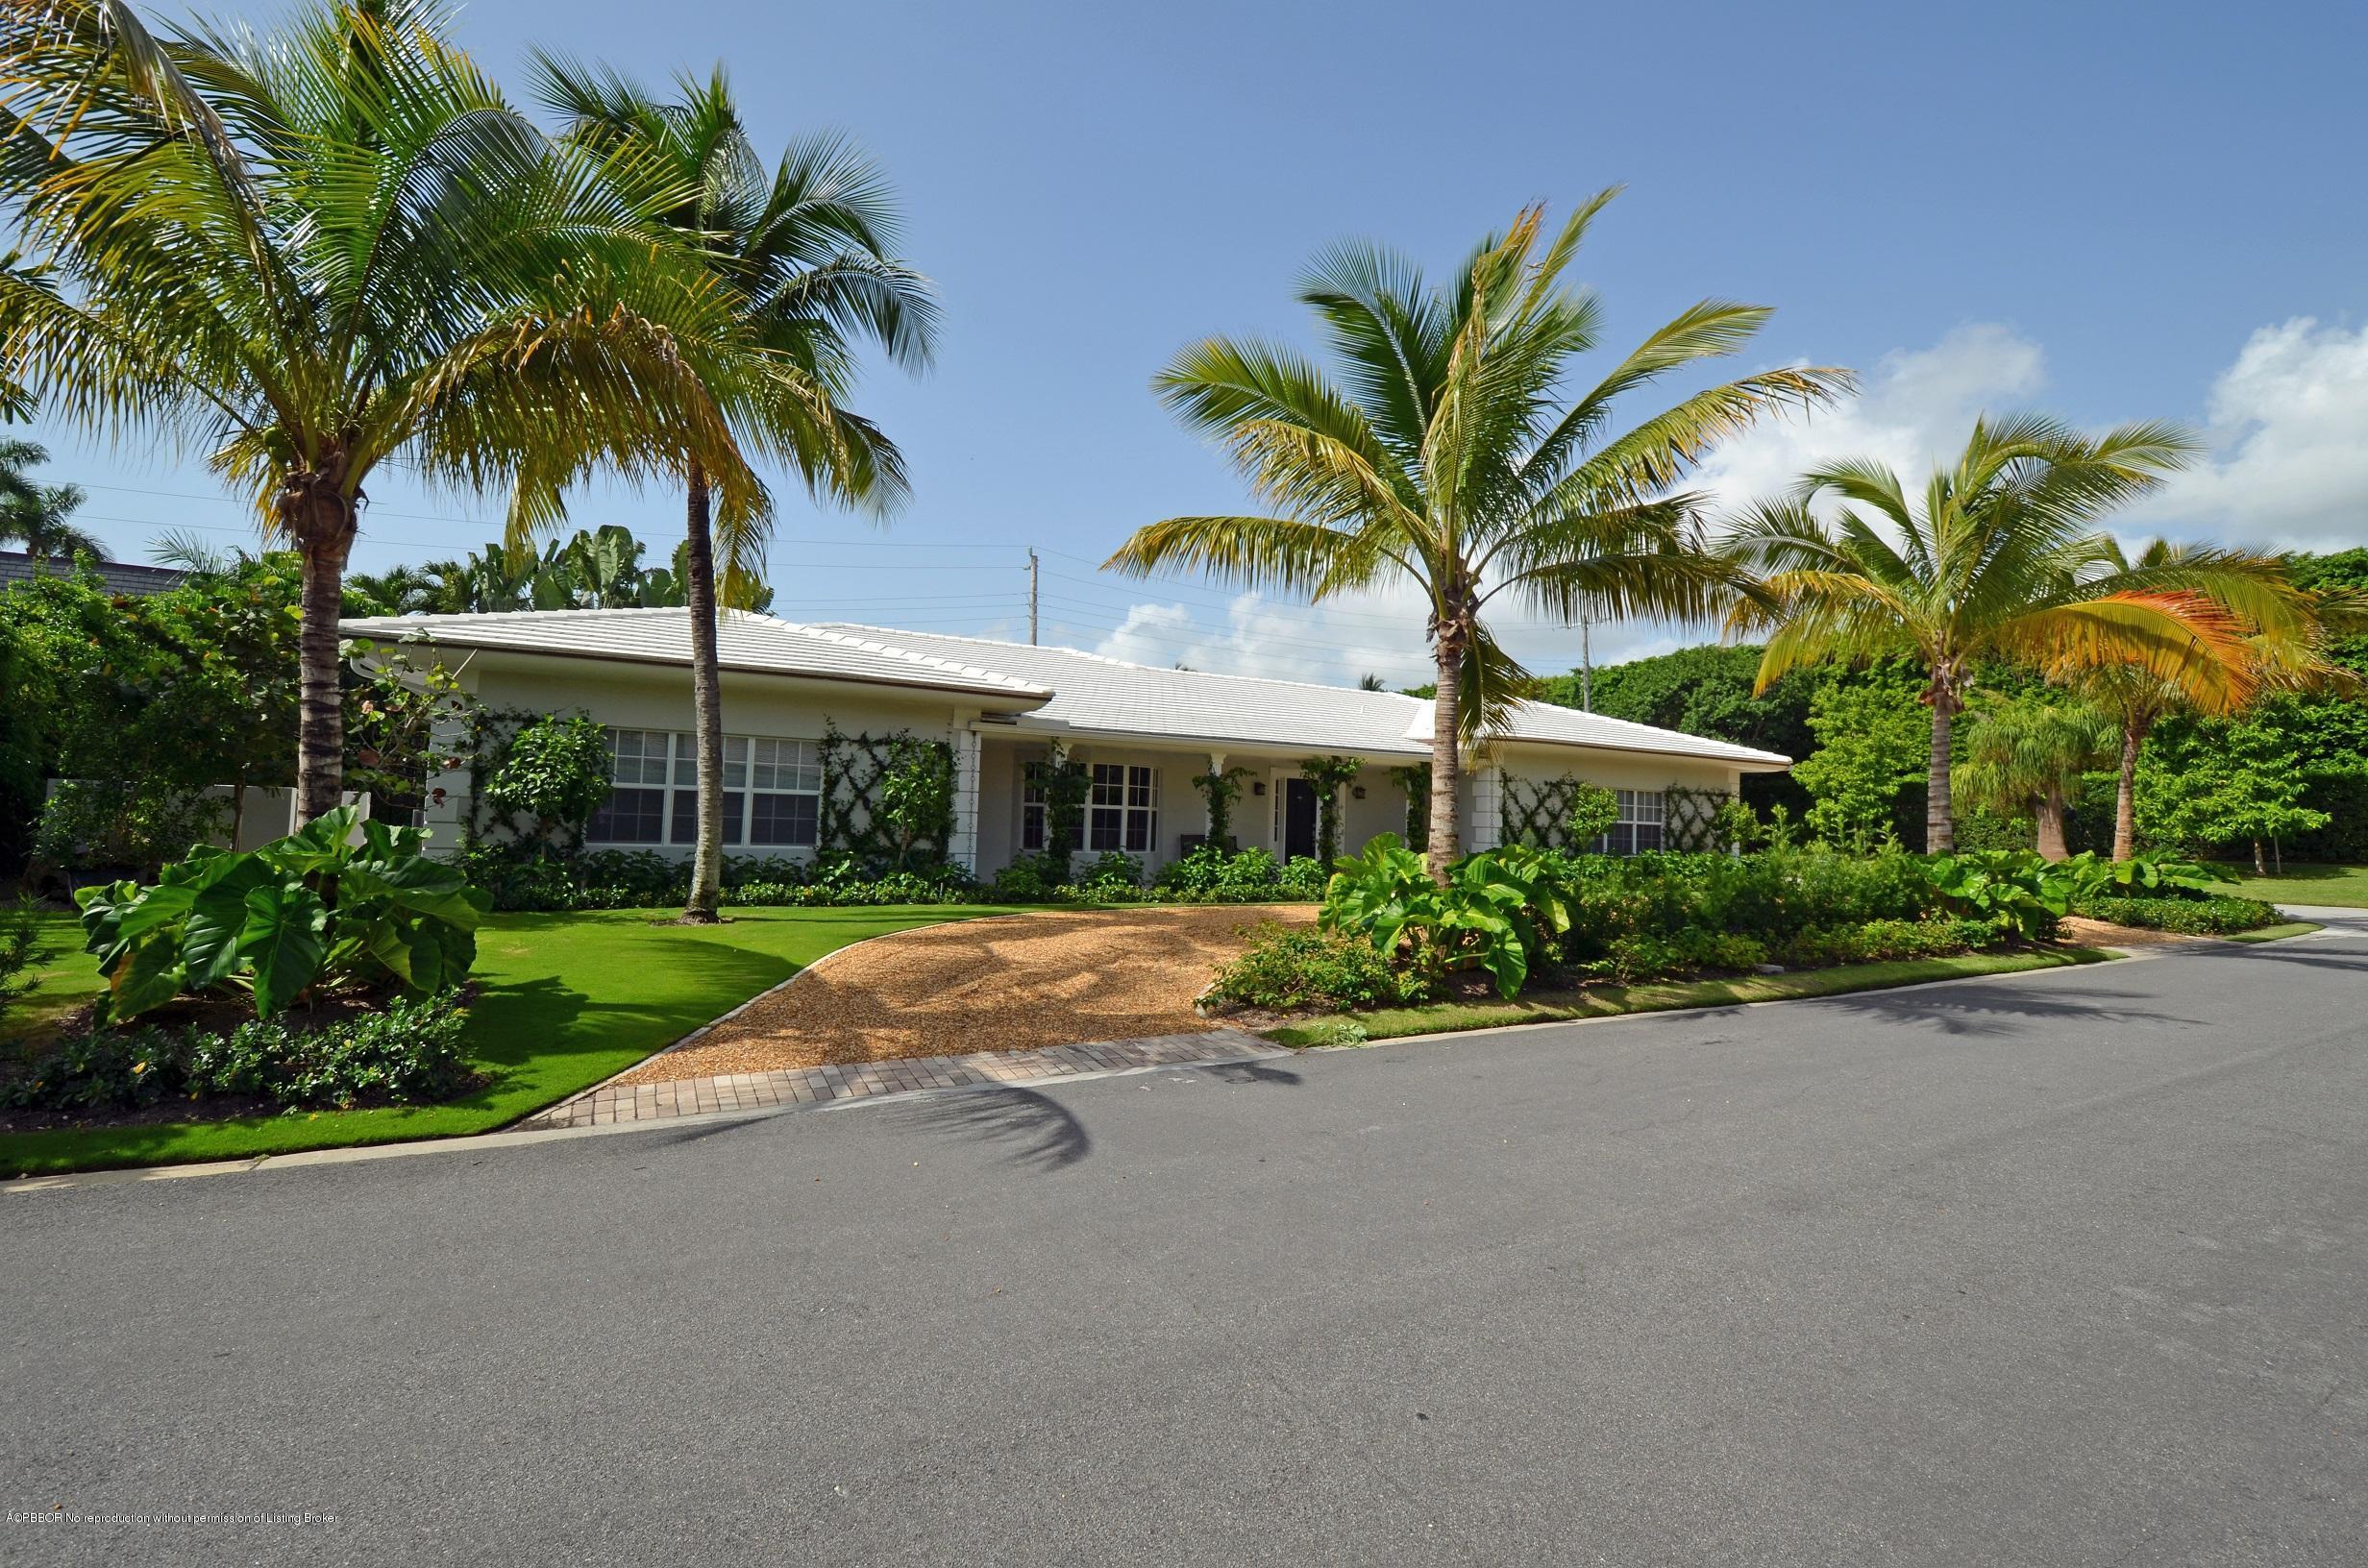 270 El Dorado Lane, Palm Beach, FL 33480